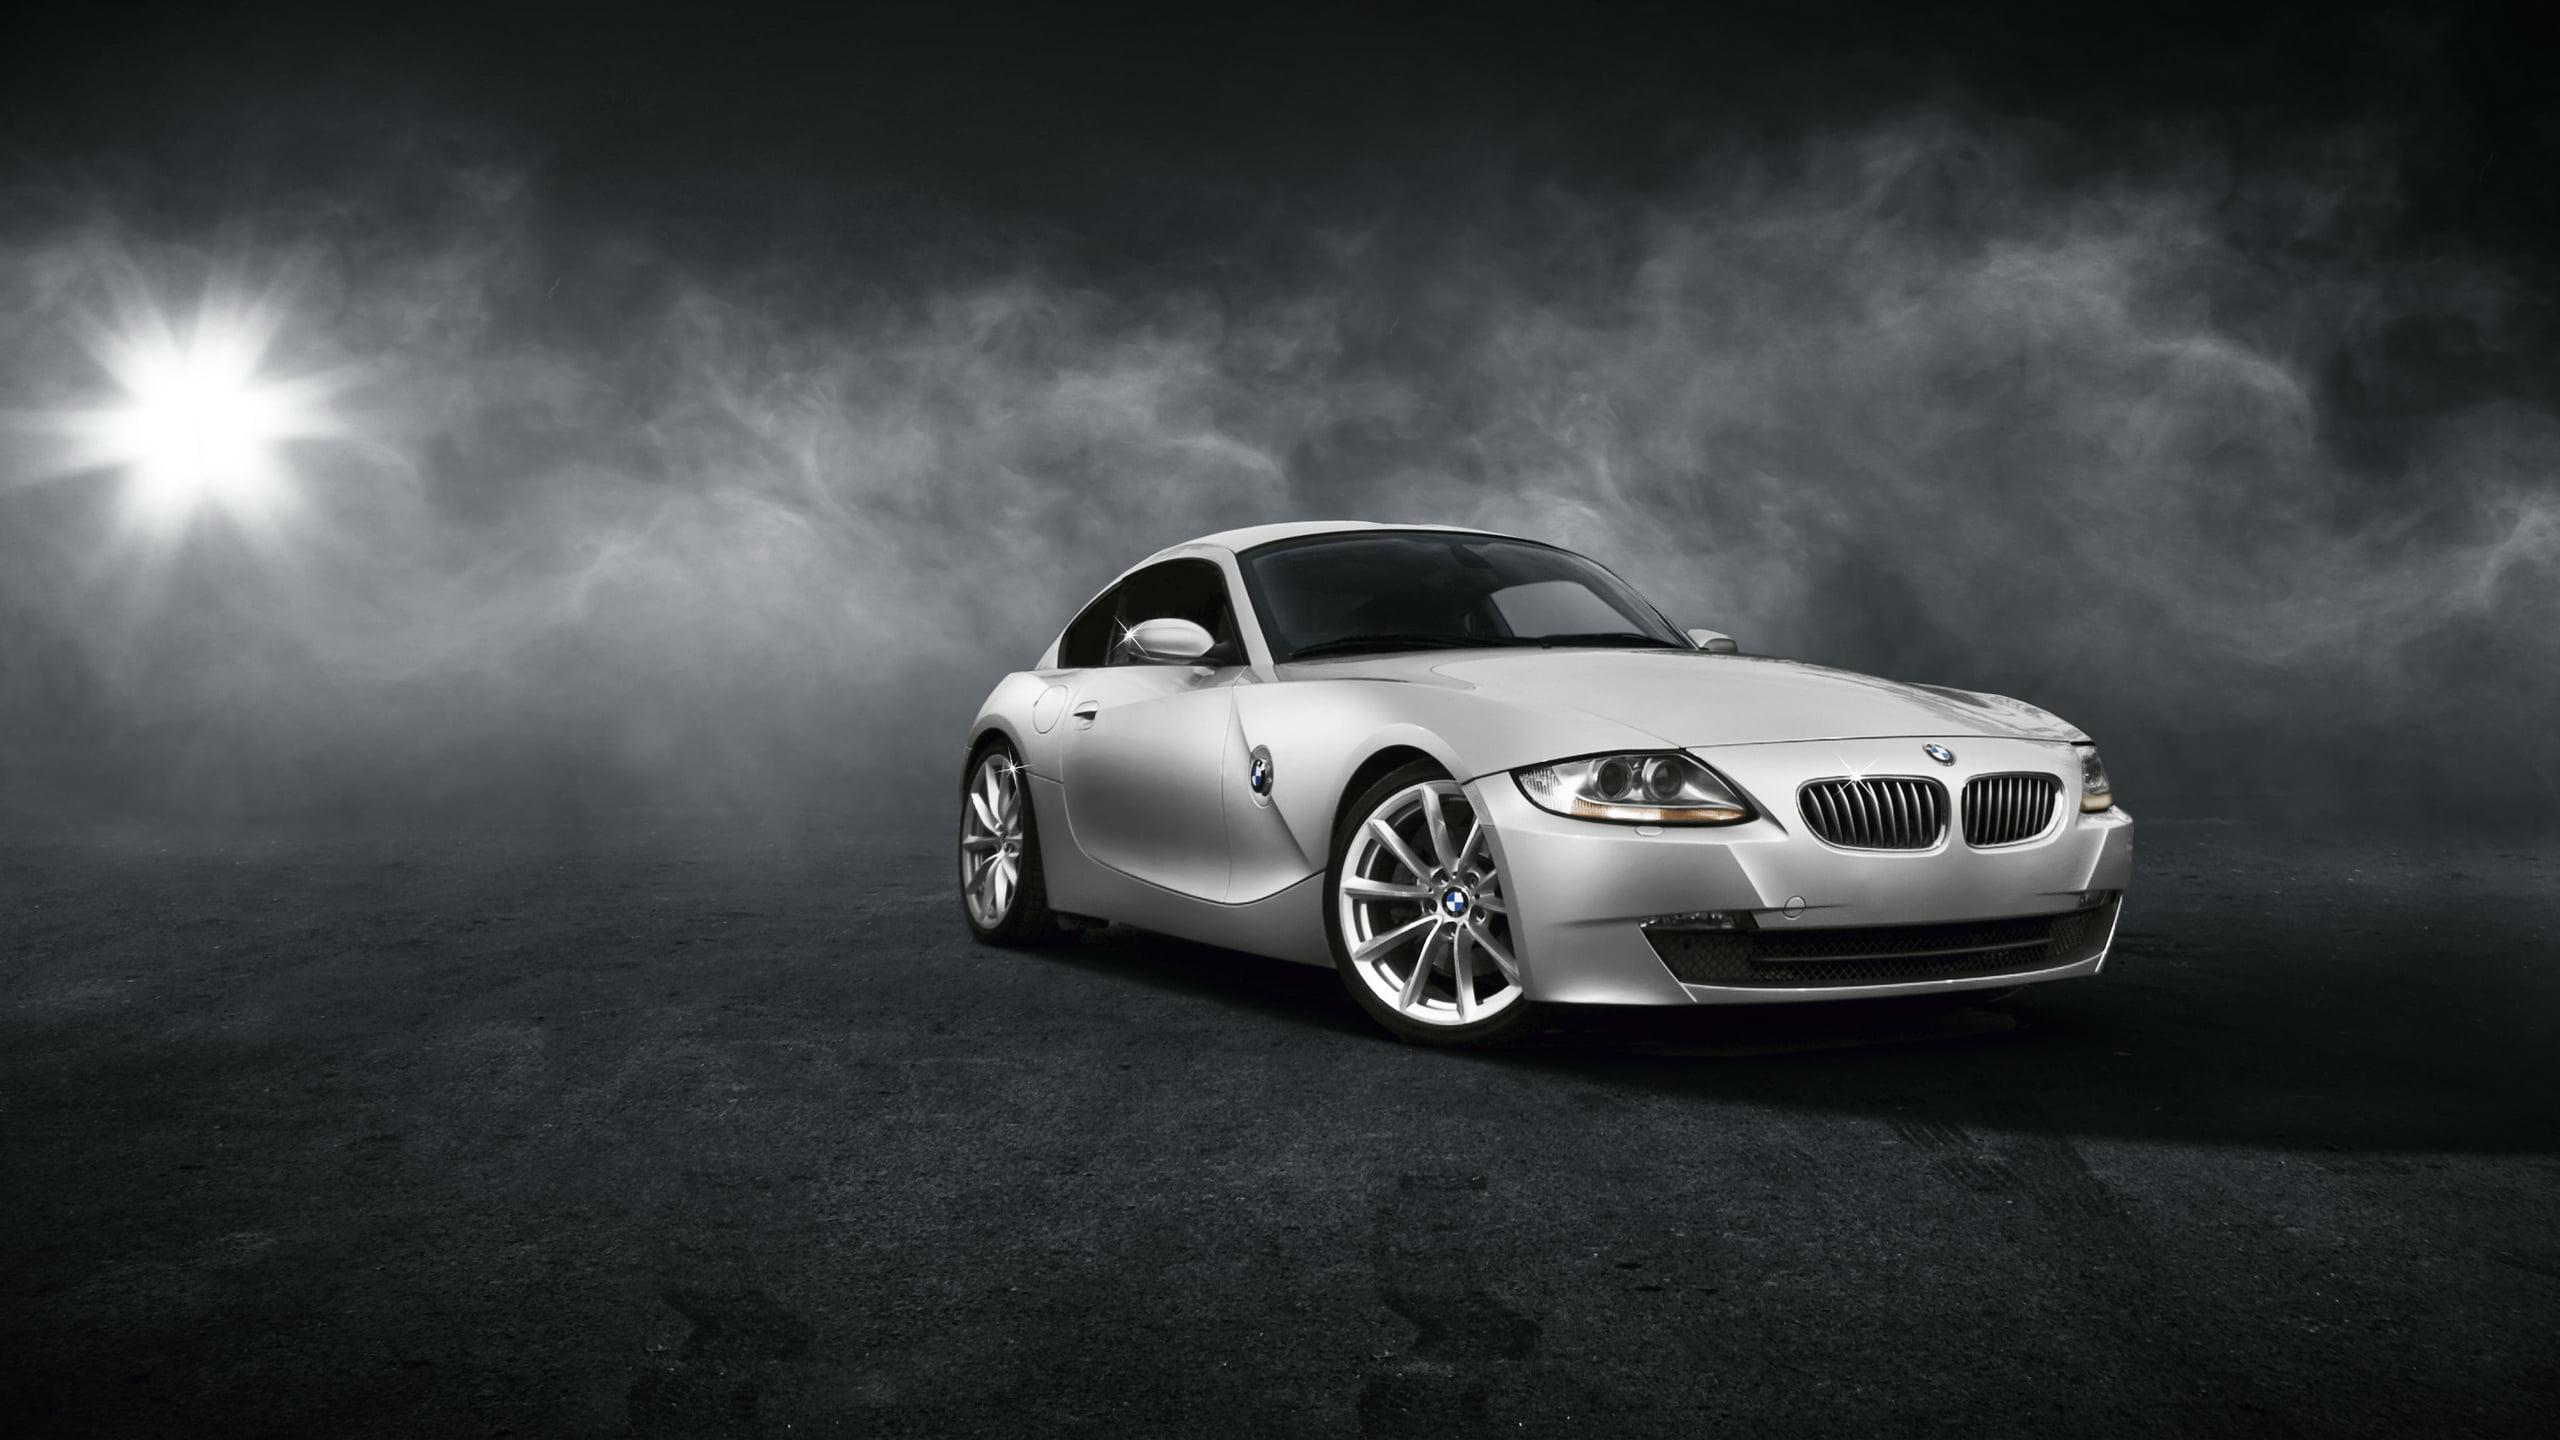 Silver BMW 1M HD wallpaper Wallpaper Flare 2560x1440